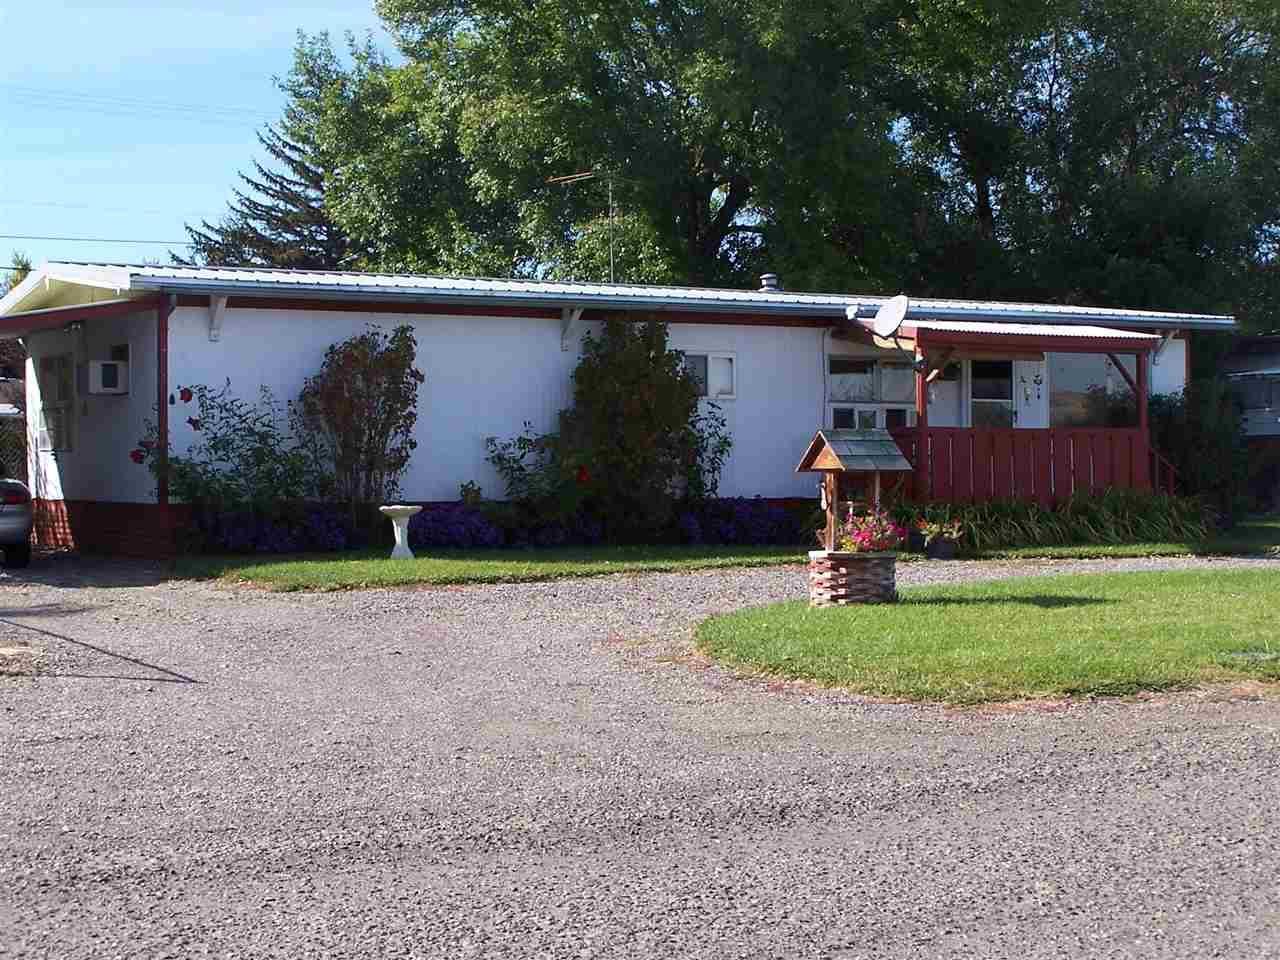 127 N Elmore Ave, Glenns Ferry, ID